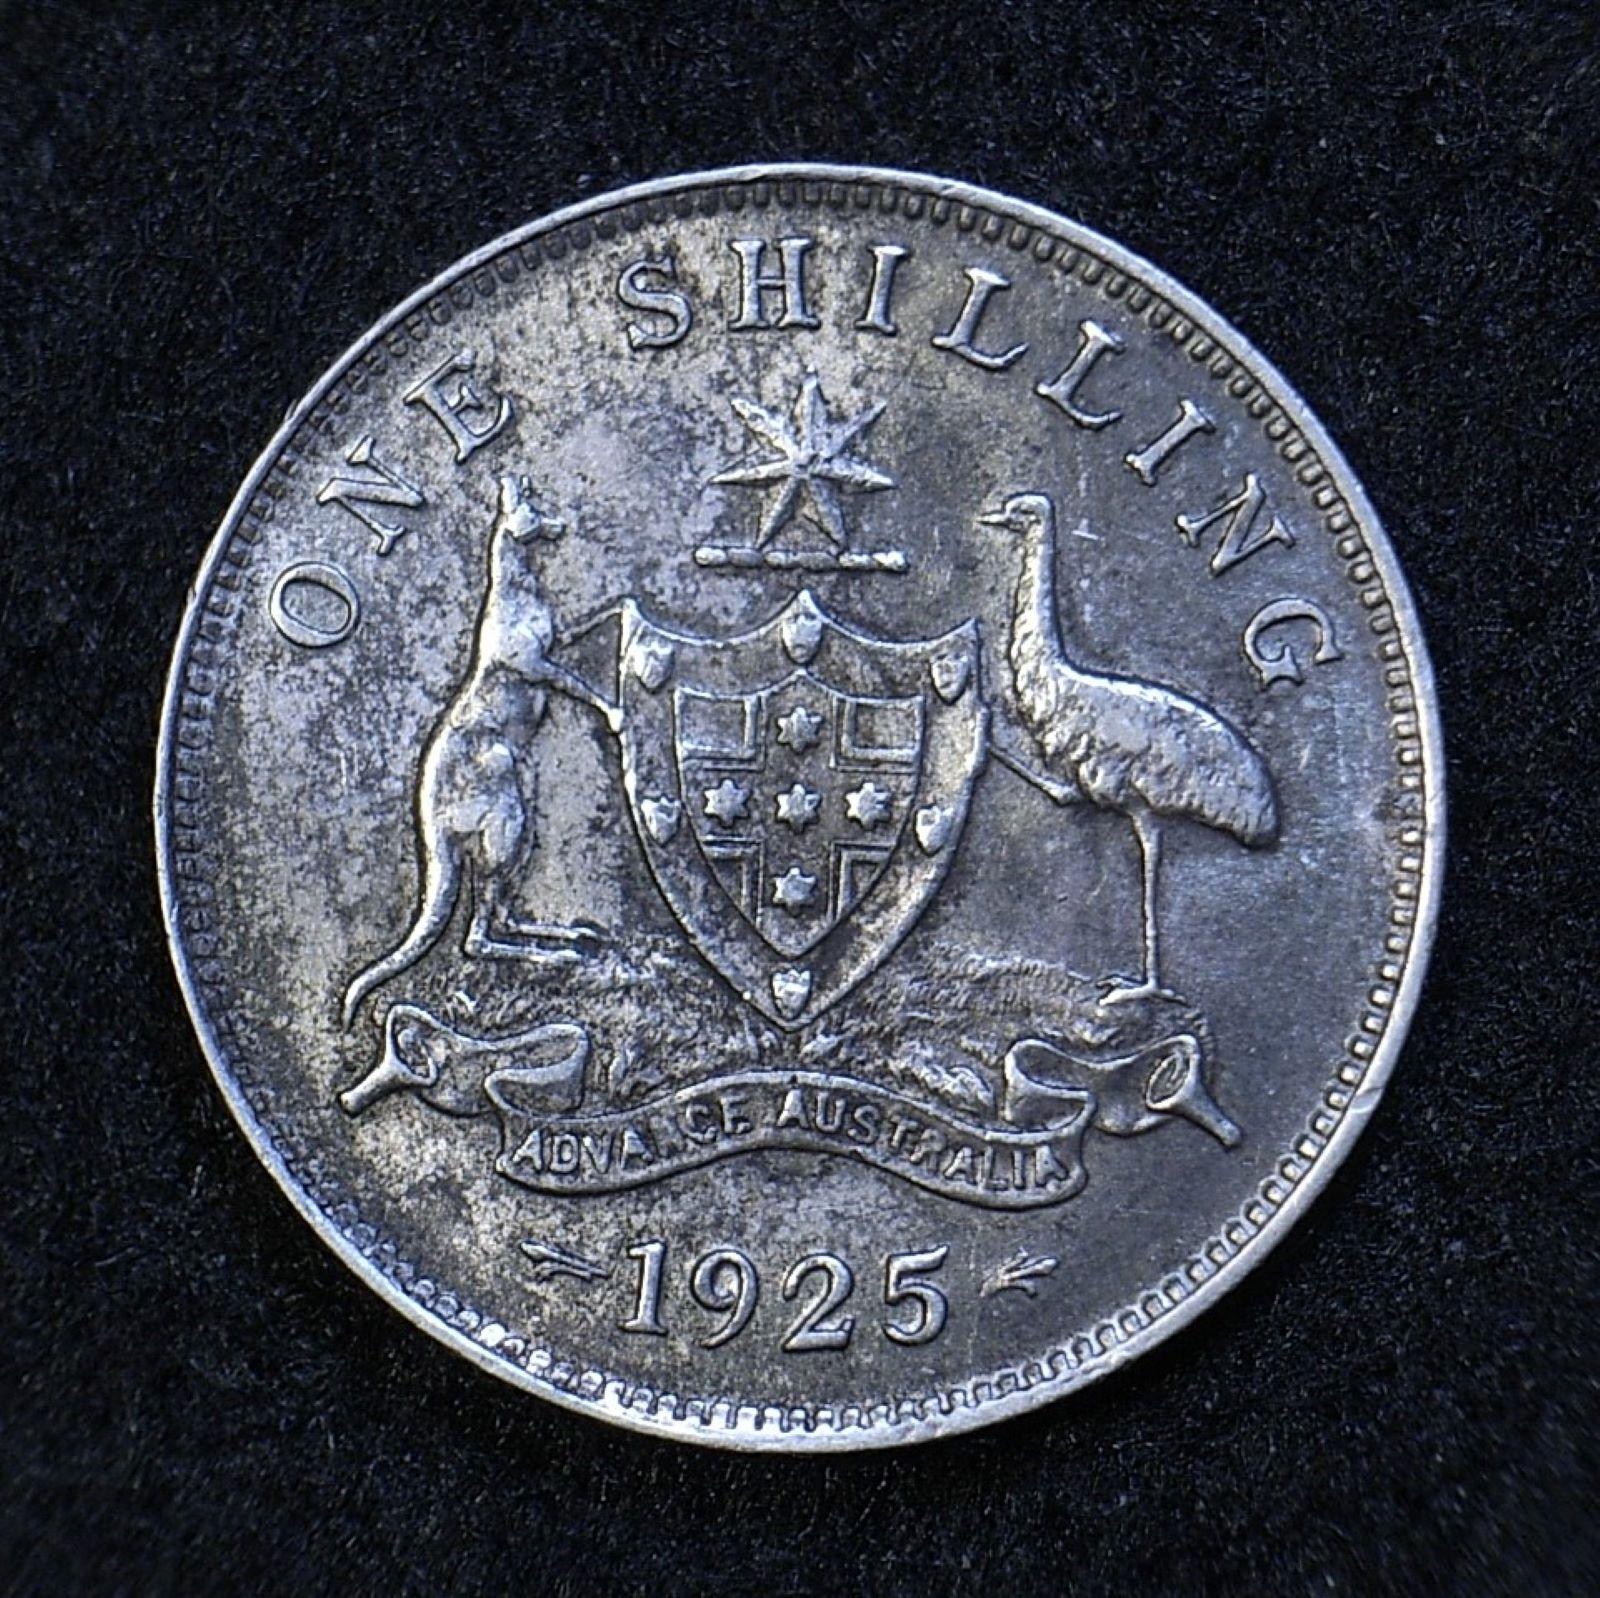 Aus Shilling 1925 rev